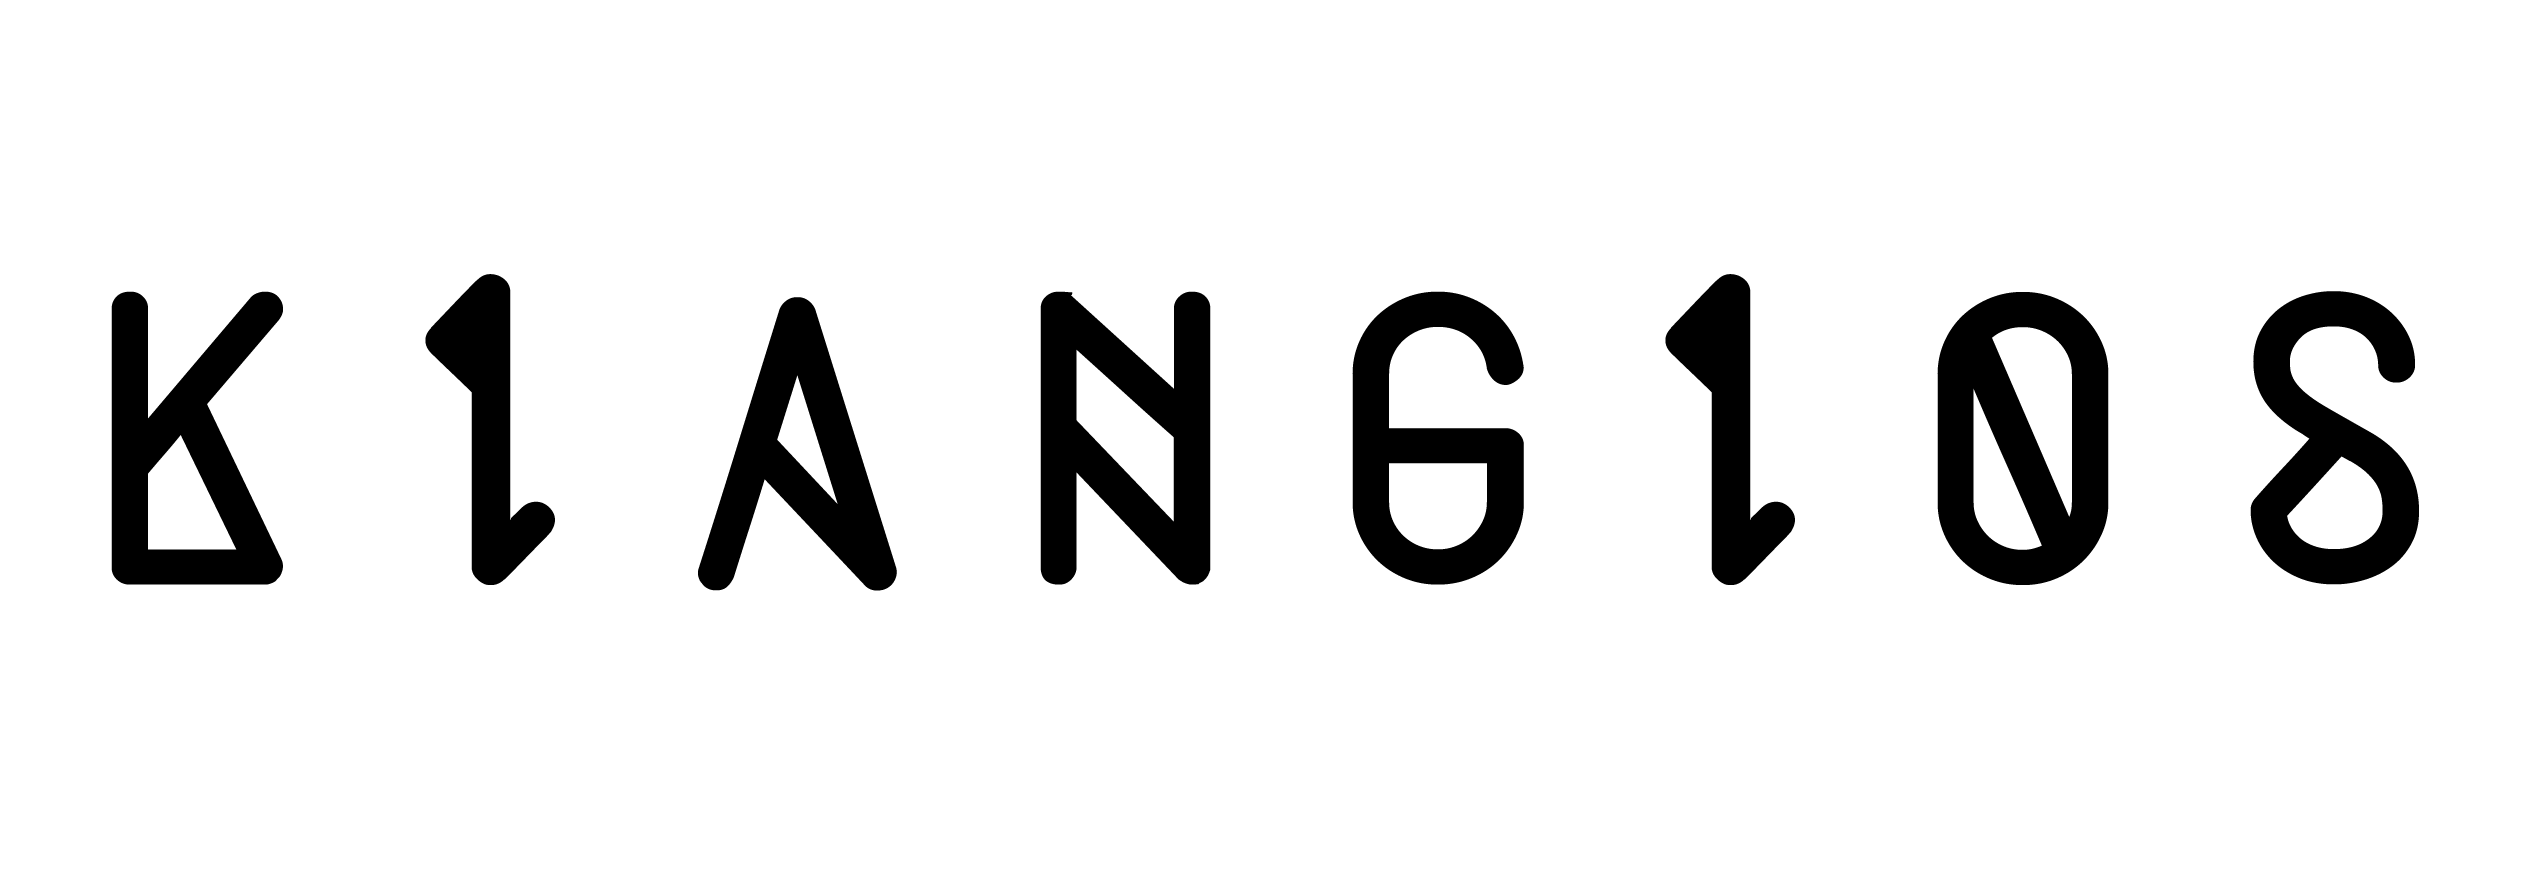 klanglos-logo